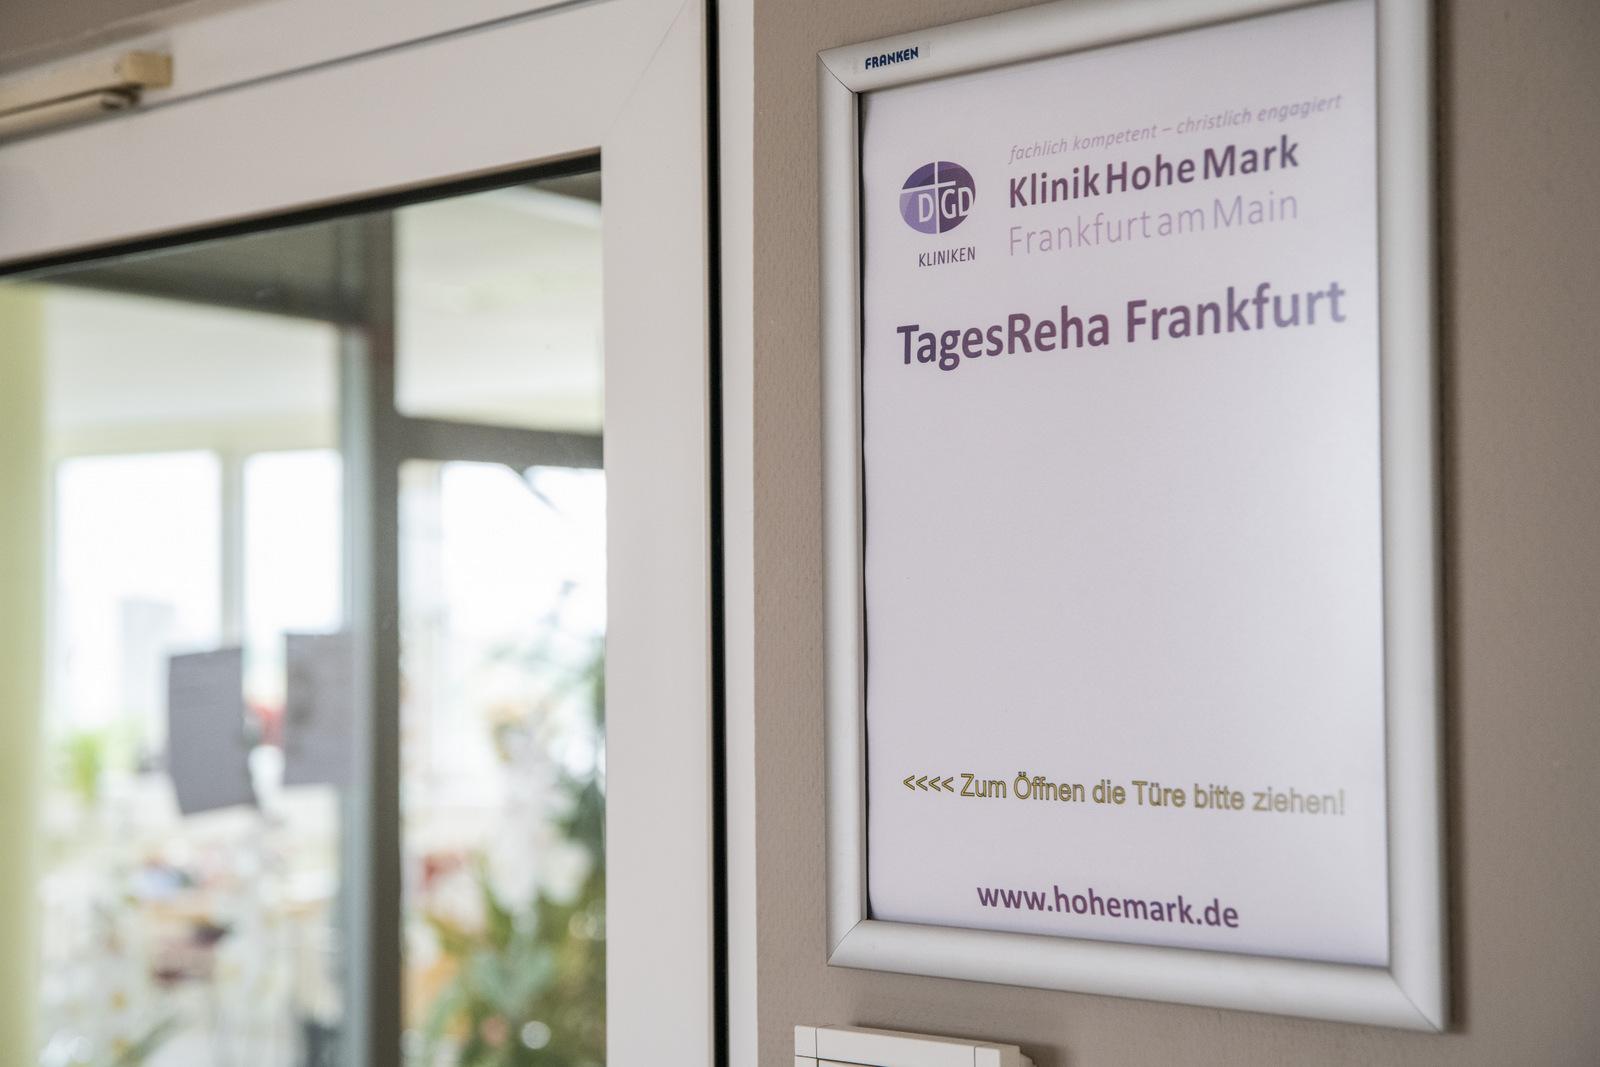 TagesReha Frankfurt